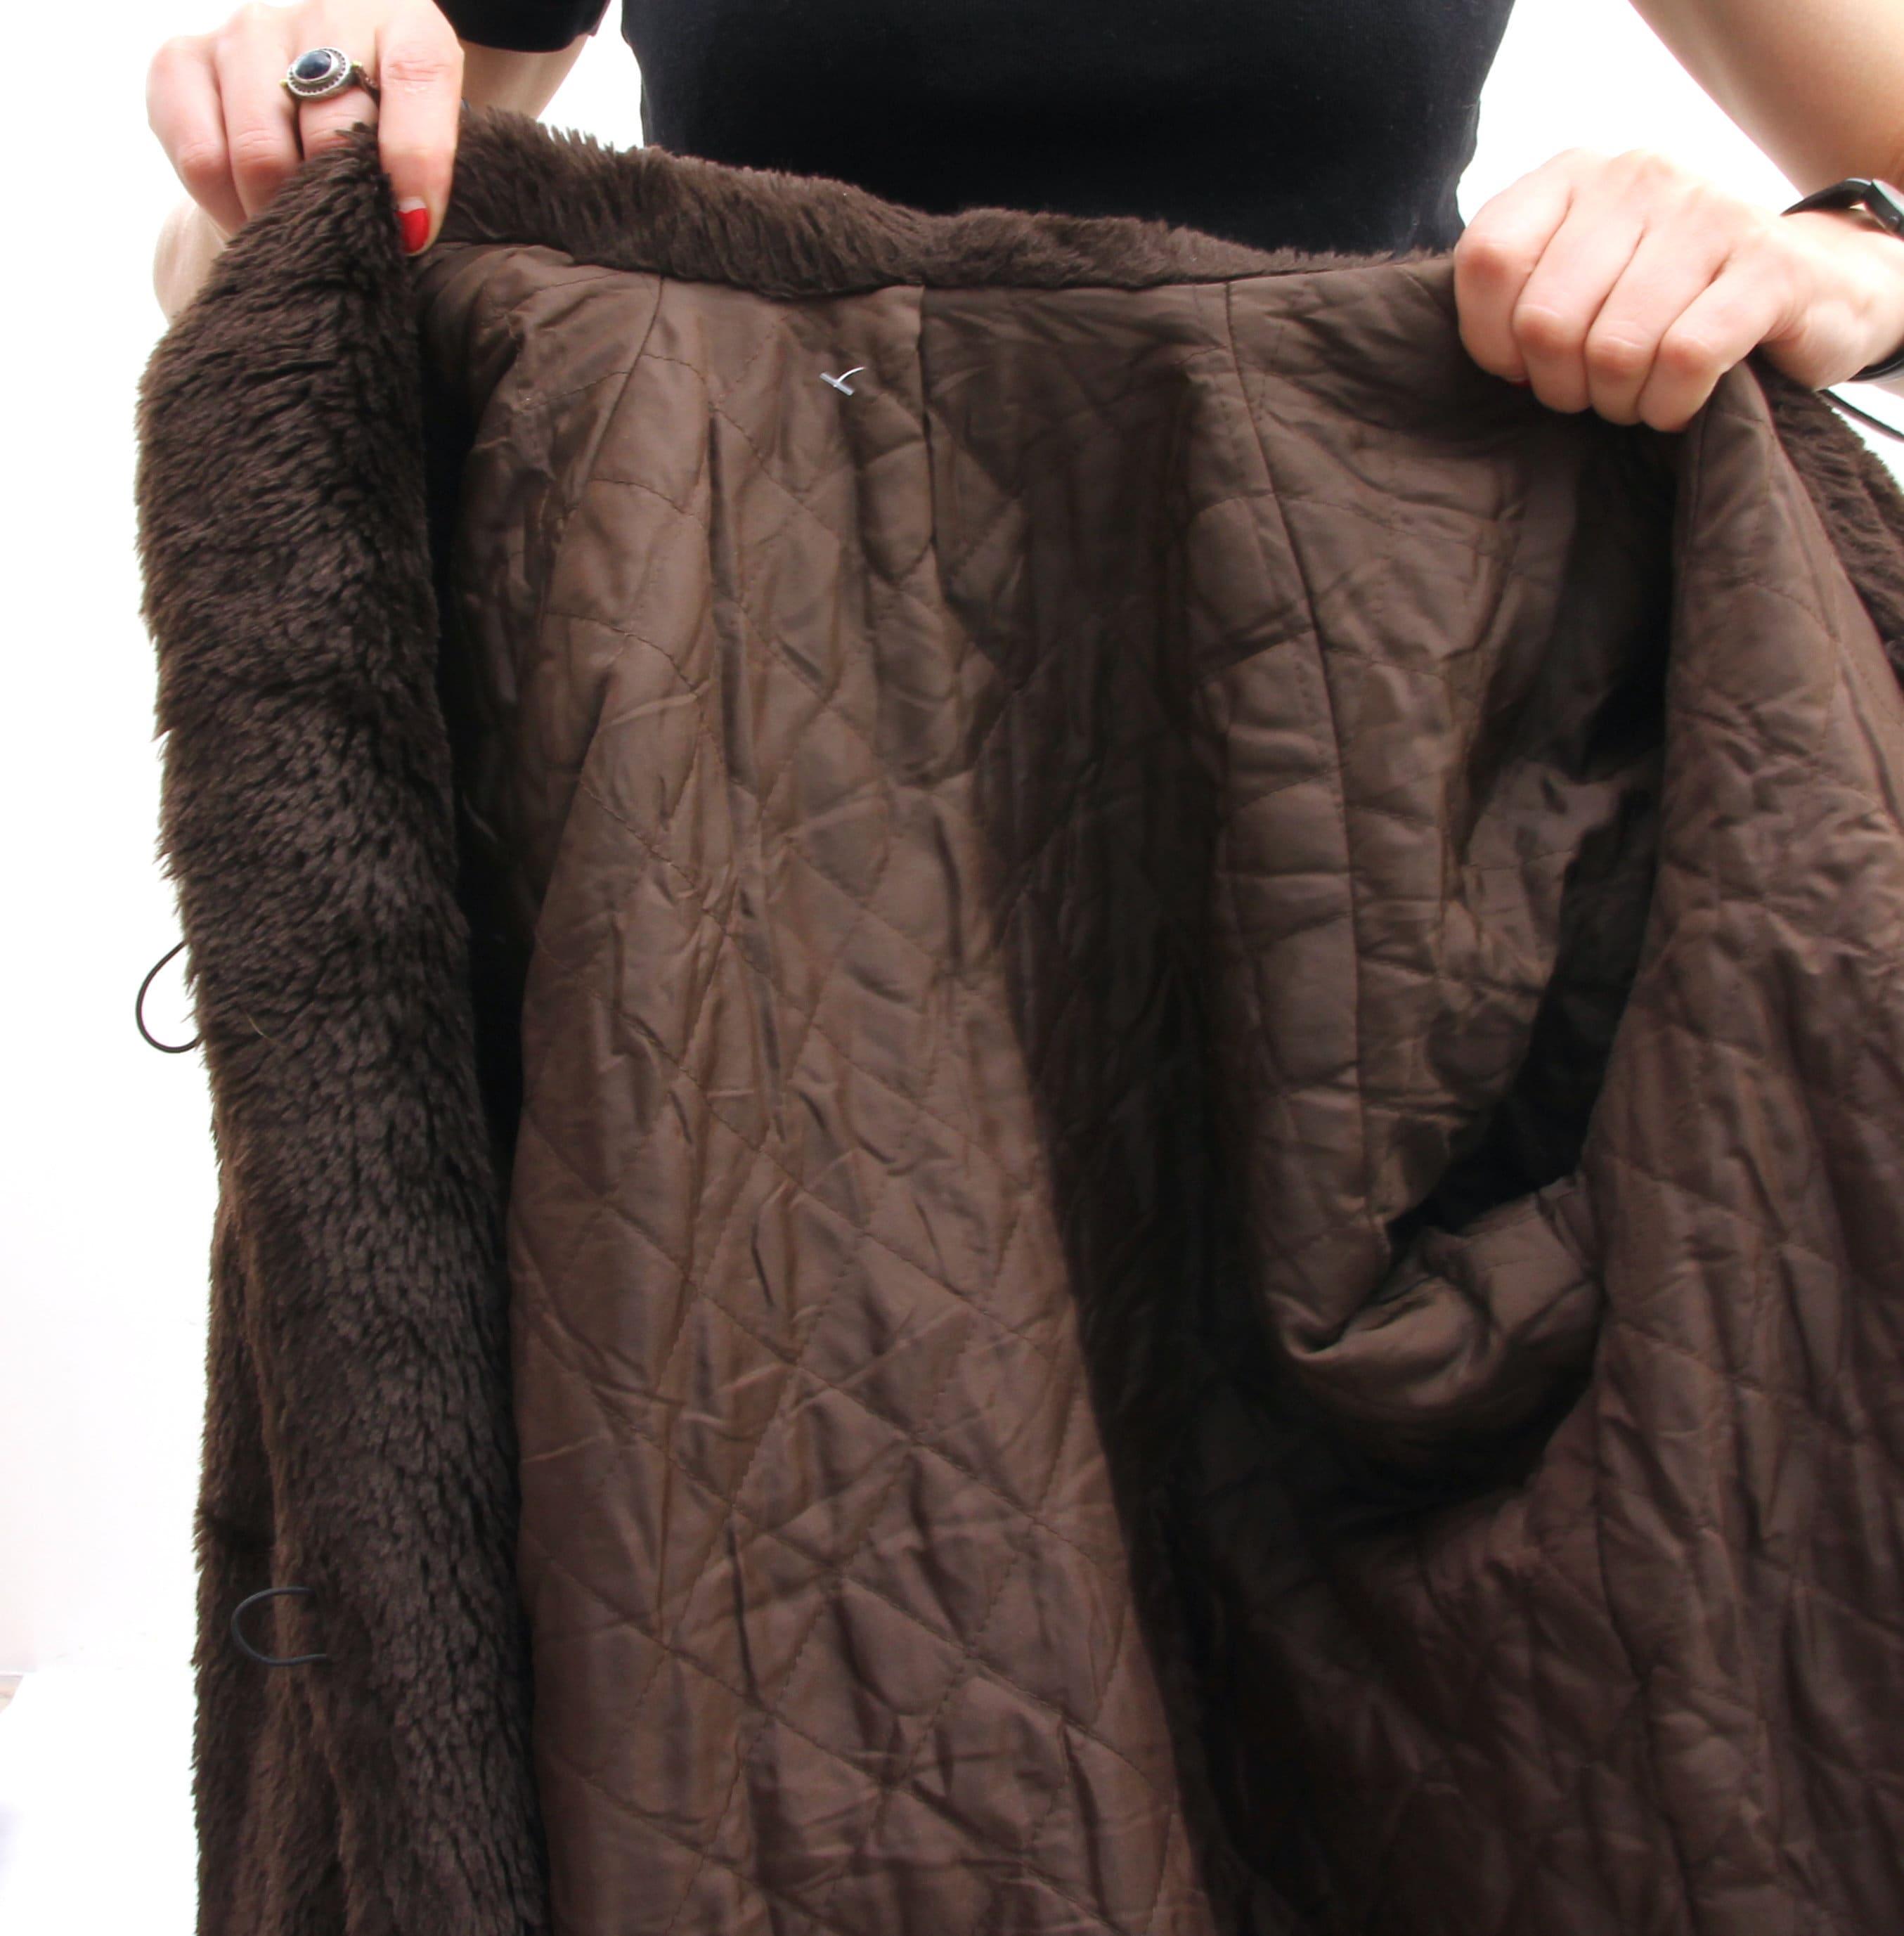 Vintage Faux Fur Coat Teddy Bear Jacket Brown Short Jacket Buttoned Furry Jacket XS